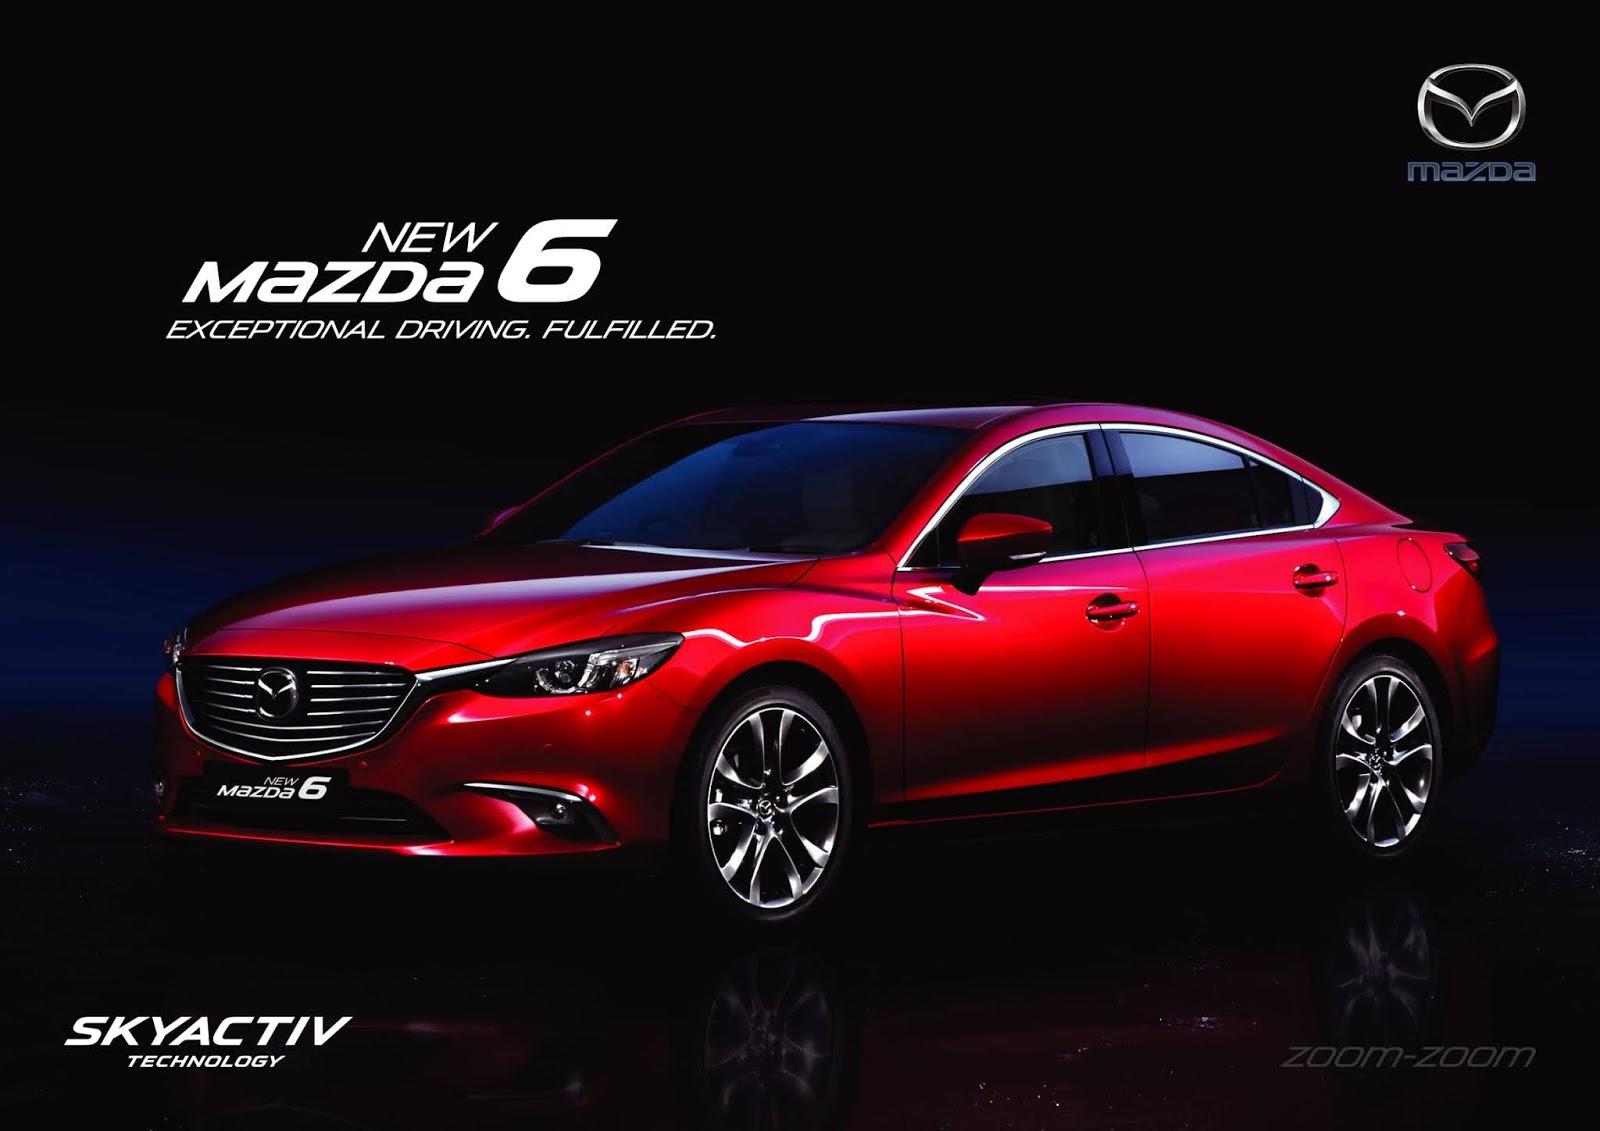 Kelebihan Kekurangan Harga Mazda Murah Berkualitas